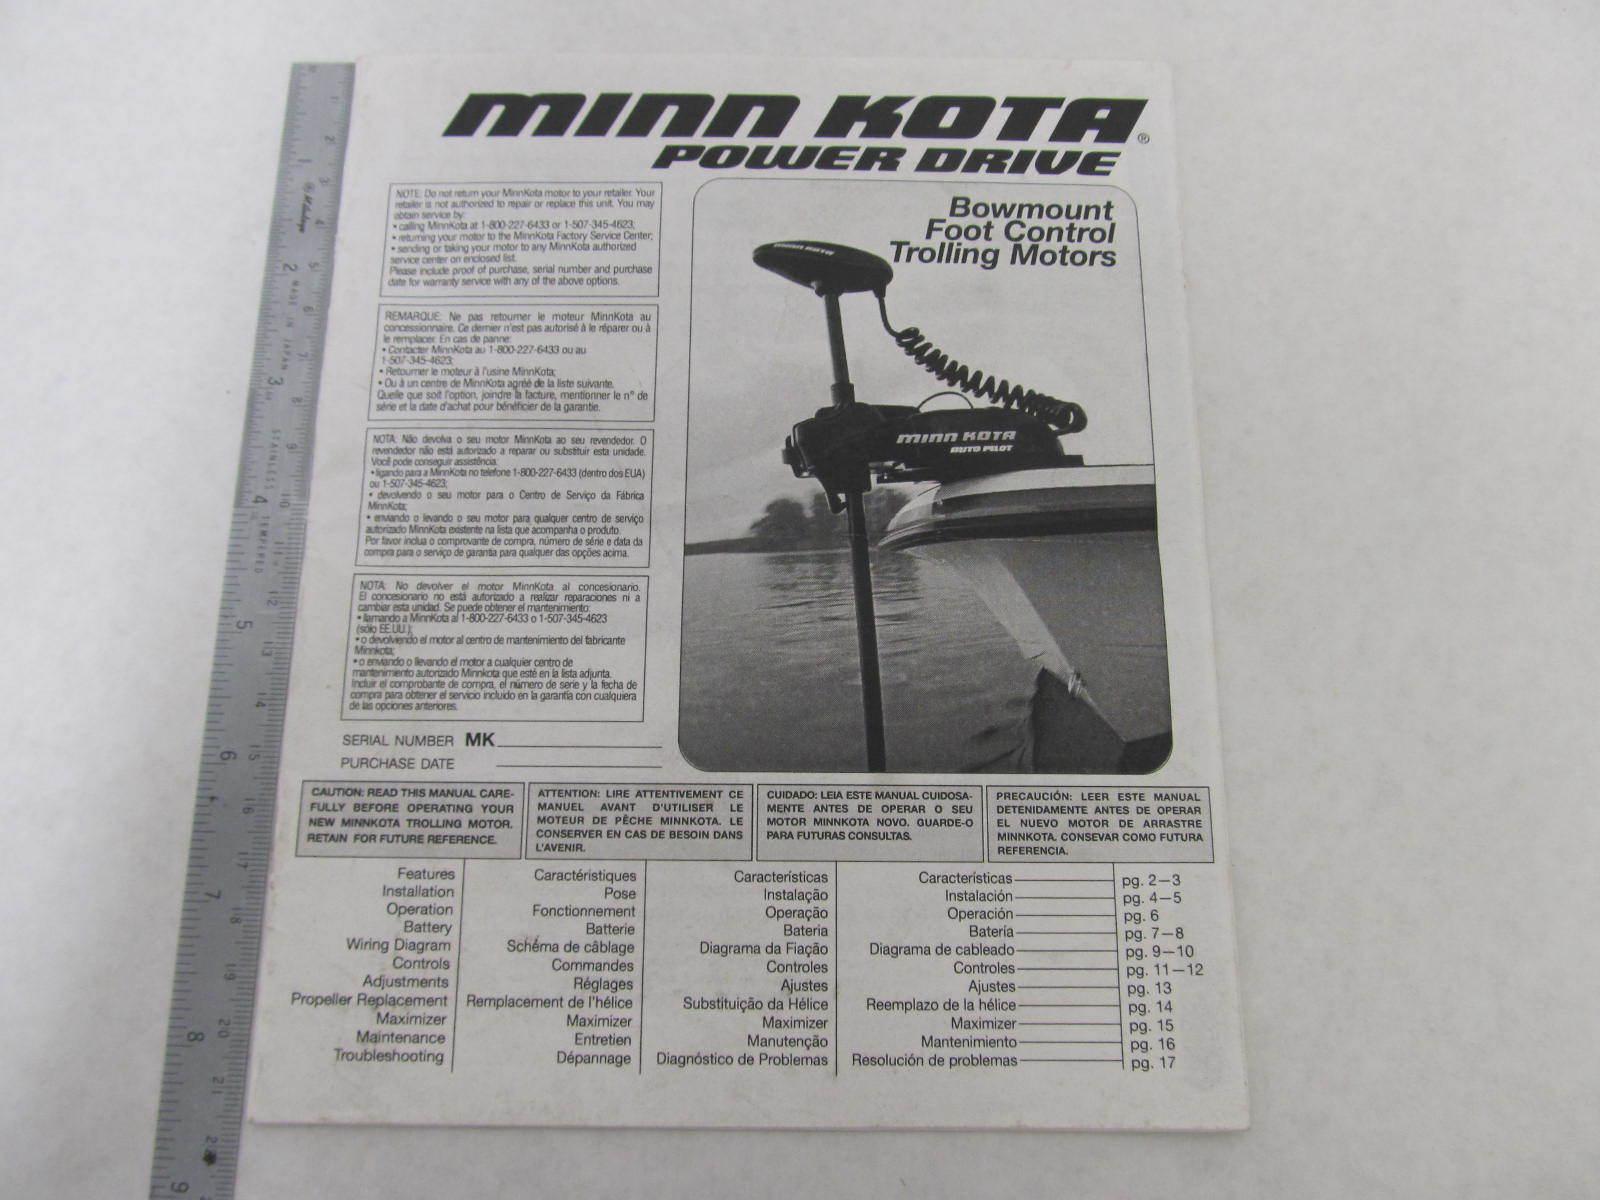 Minn Kota Repair Diagram Electrical Wiring E Drive Trolling Motor Manuals Newmotorspot Co Riptide